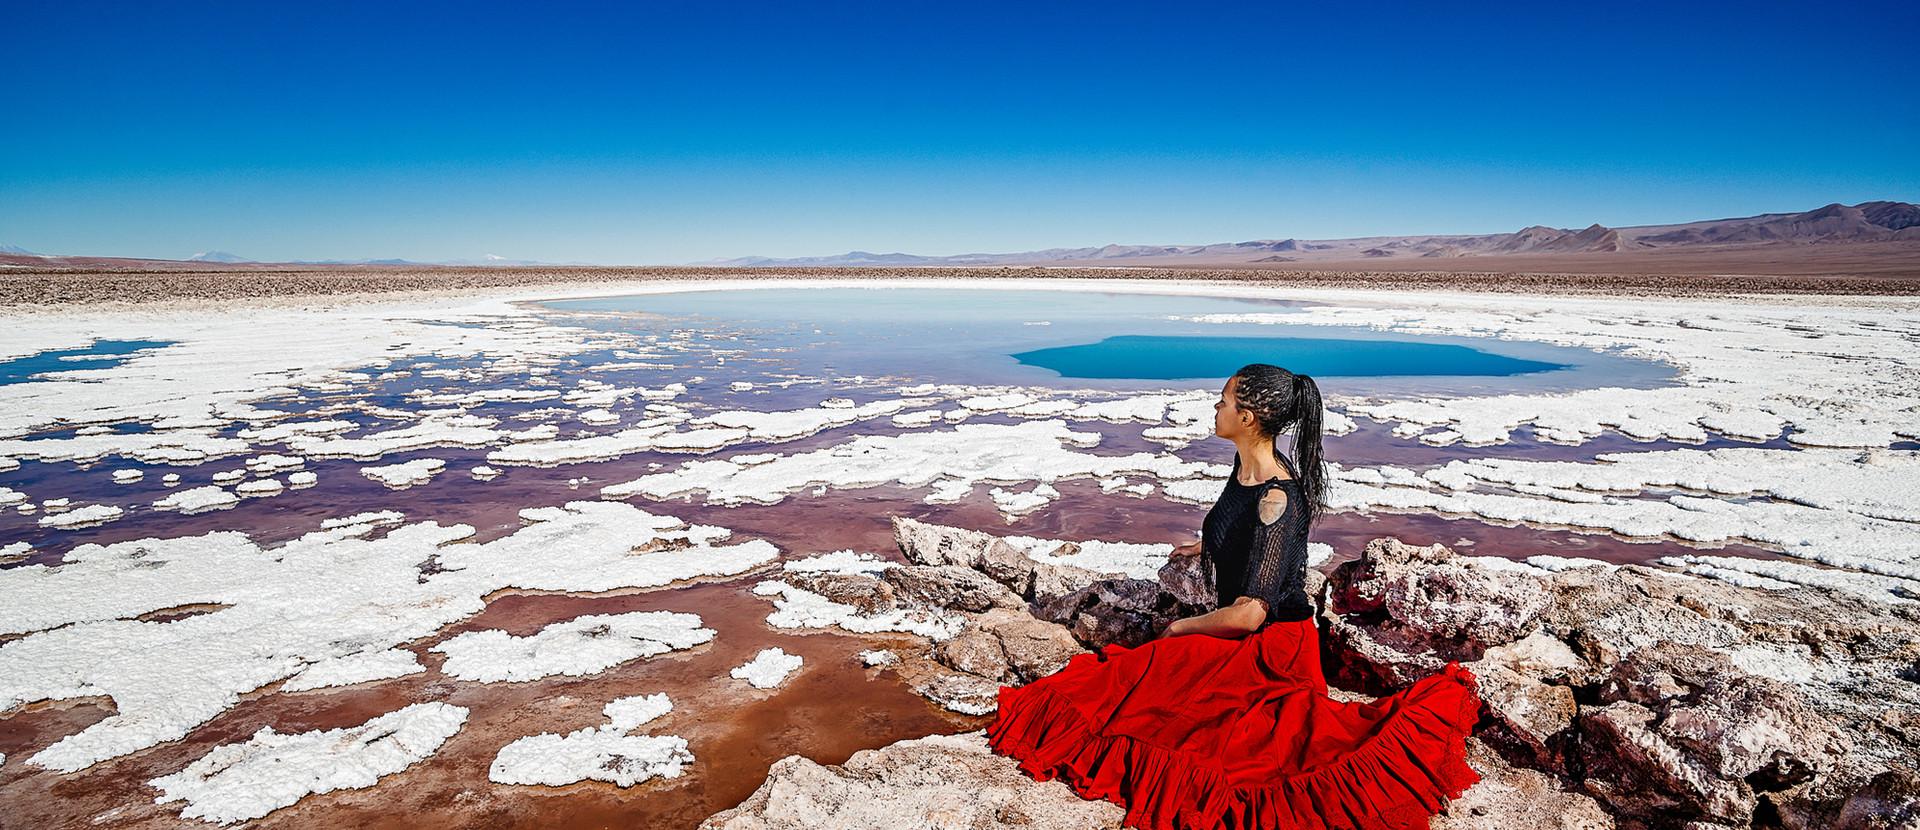 retrato portrait mujer sentada sitting bailando desierto de atacama desert woman dancing skirt dress blue skies lagunas escondidas baltinache lagoon blue salt flats salar white